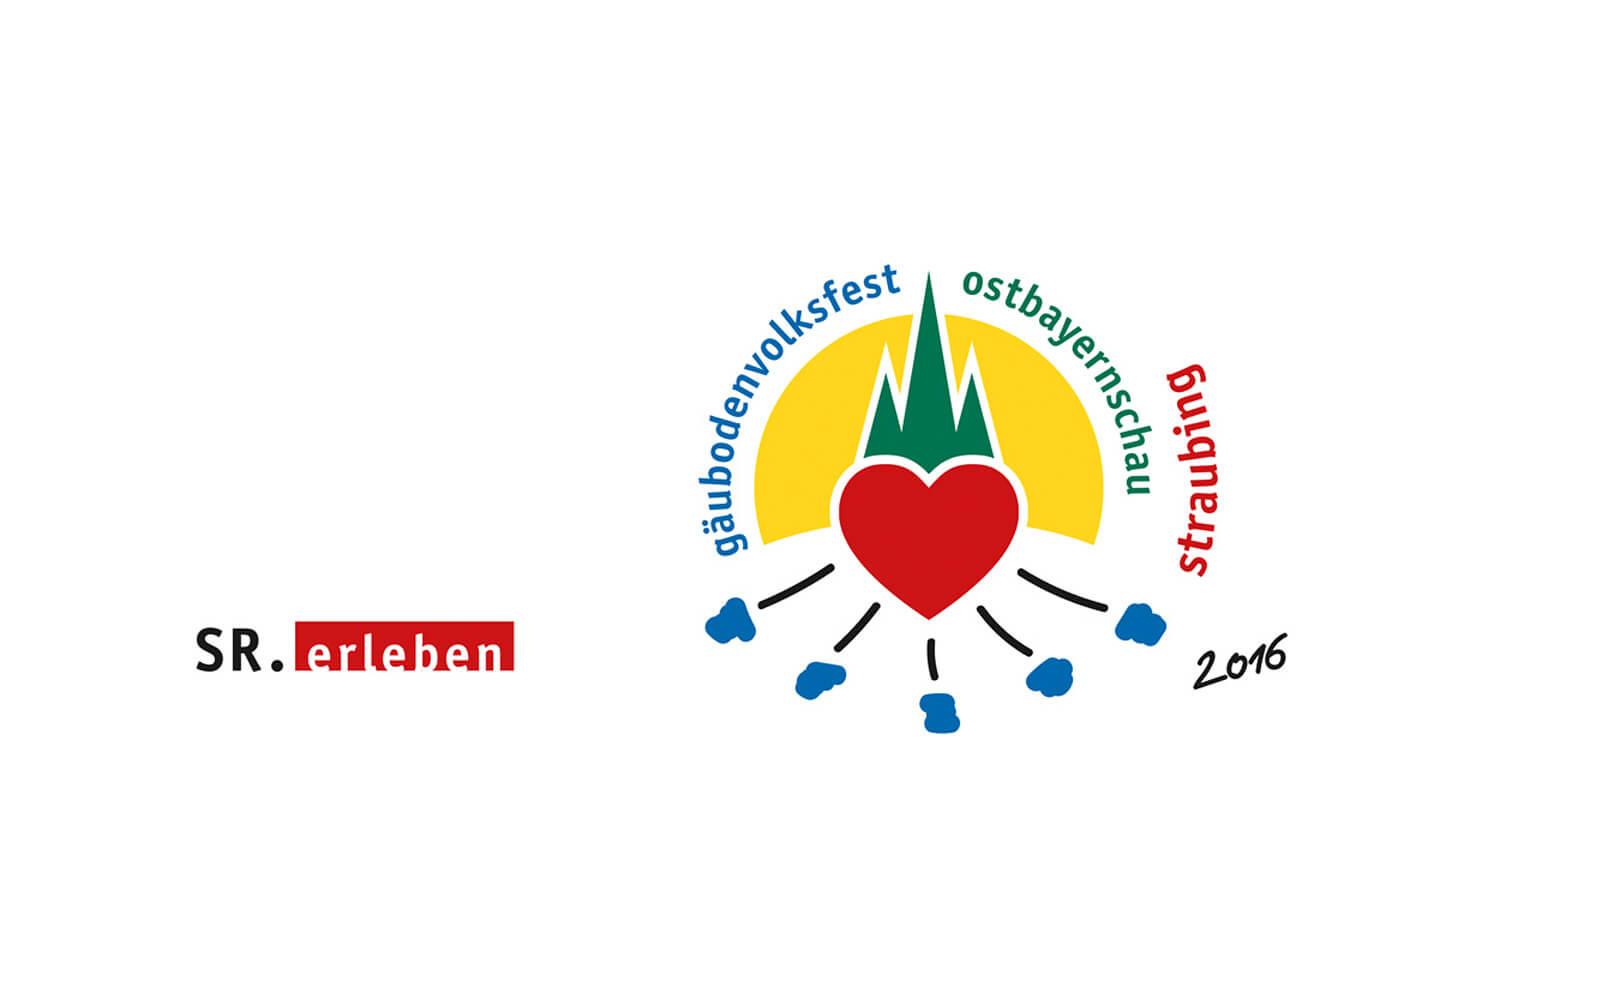 Motiv Sammlertasse für's Gäubodenvolksfest & Ostbayernschau 2016